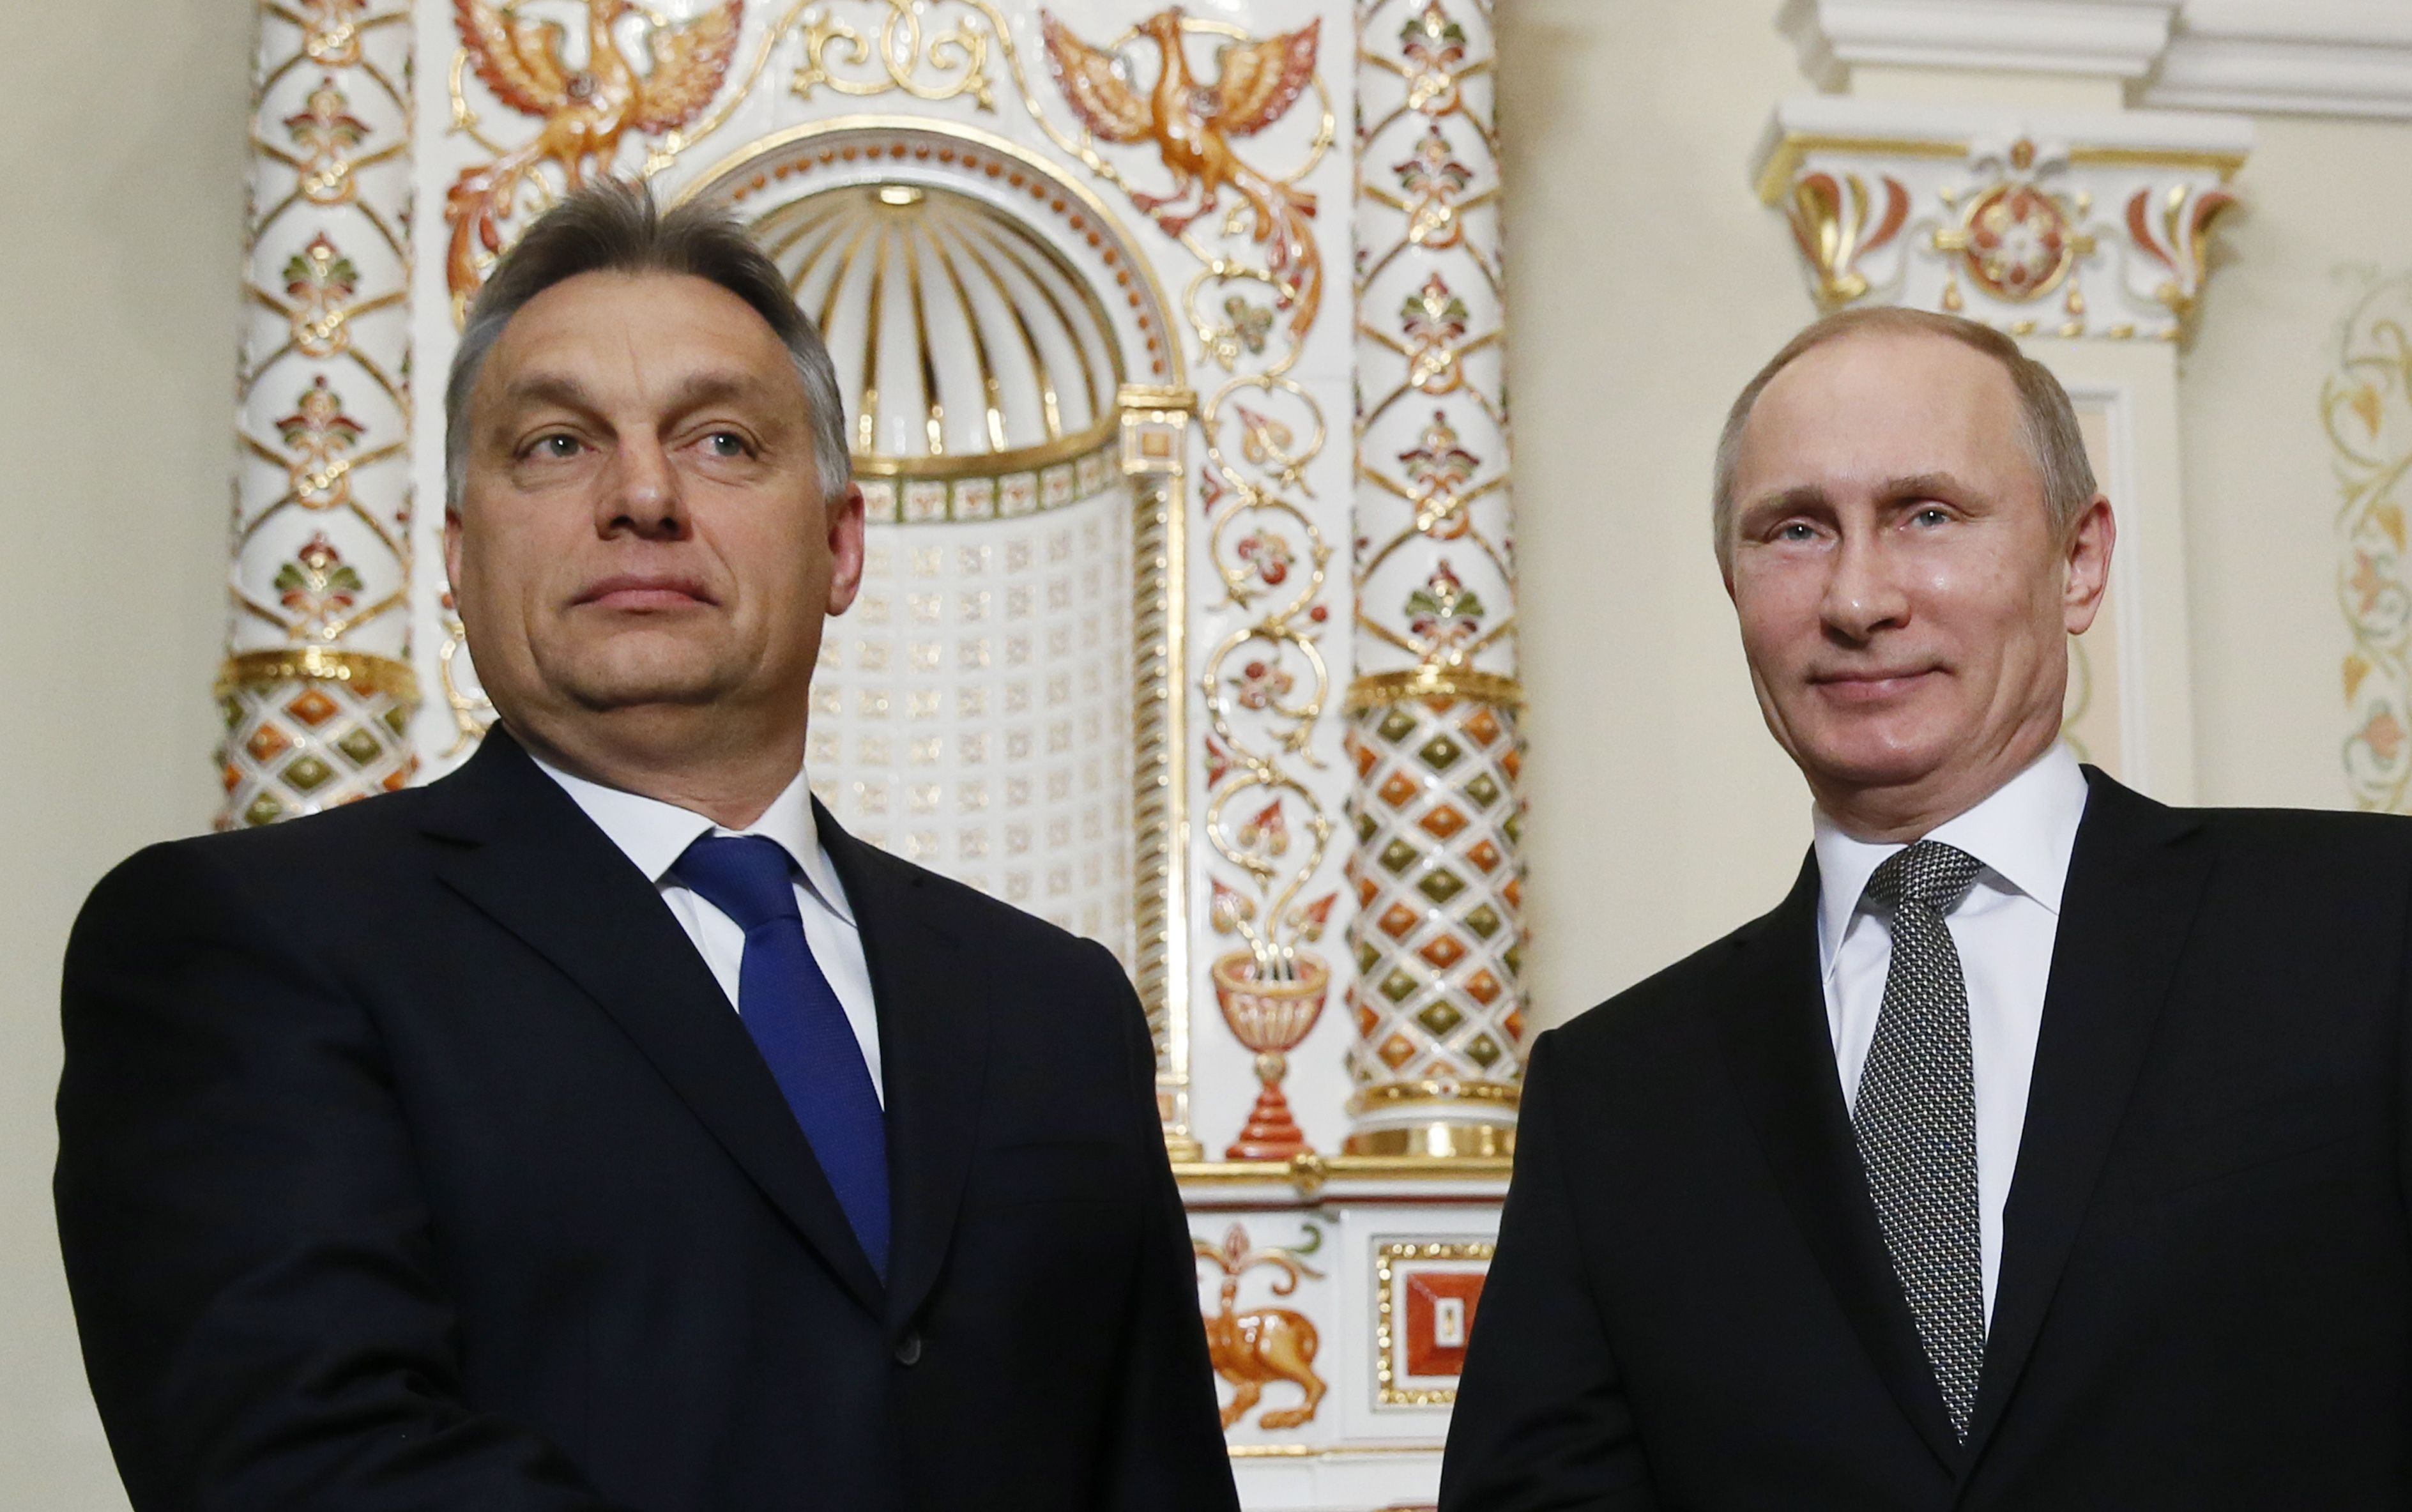 Viktor Orbán, Vladimir Putin